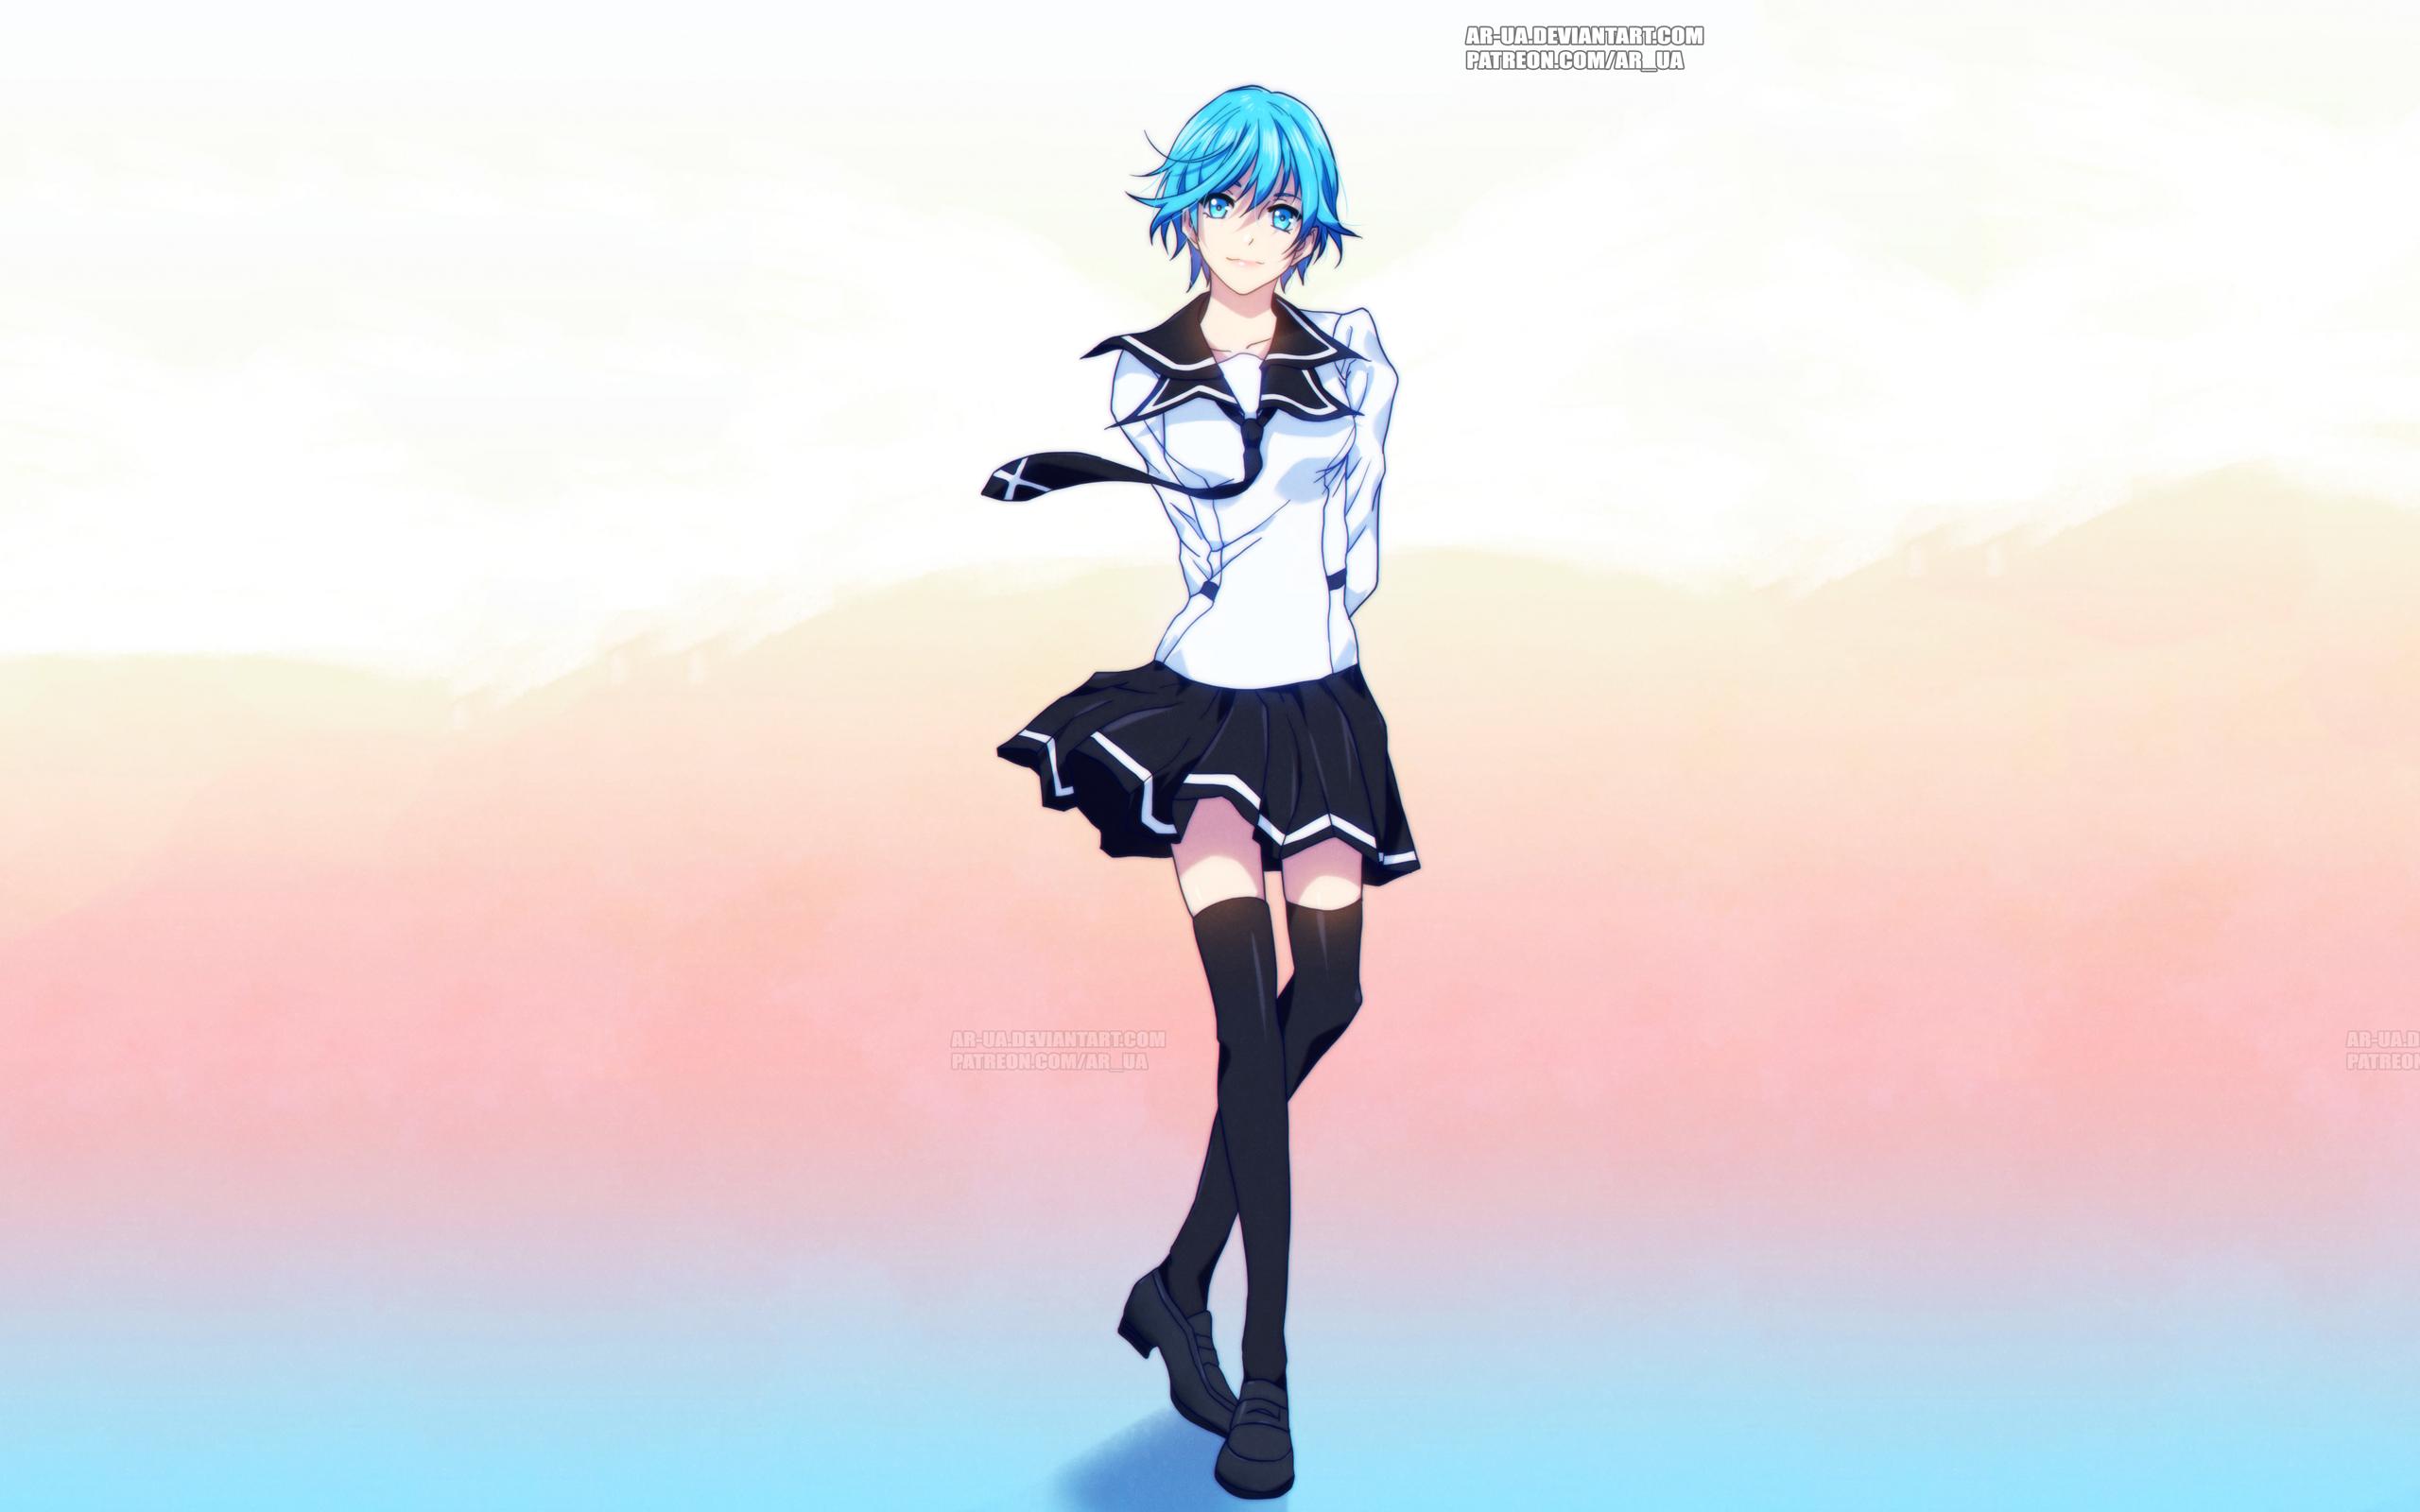 Fuuka Hd Wallpaper Background Image 2560x1600 Id784975